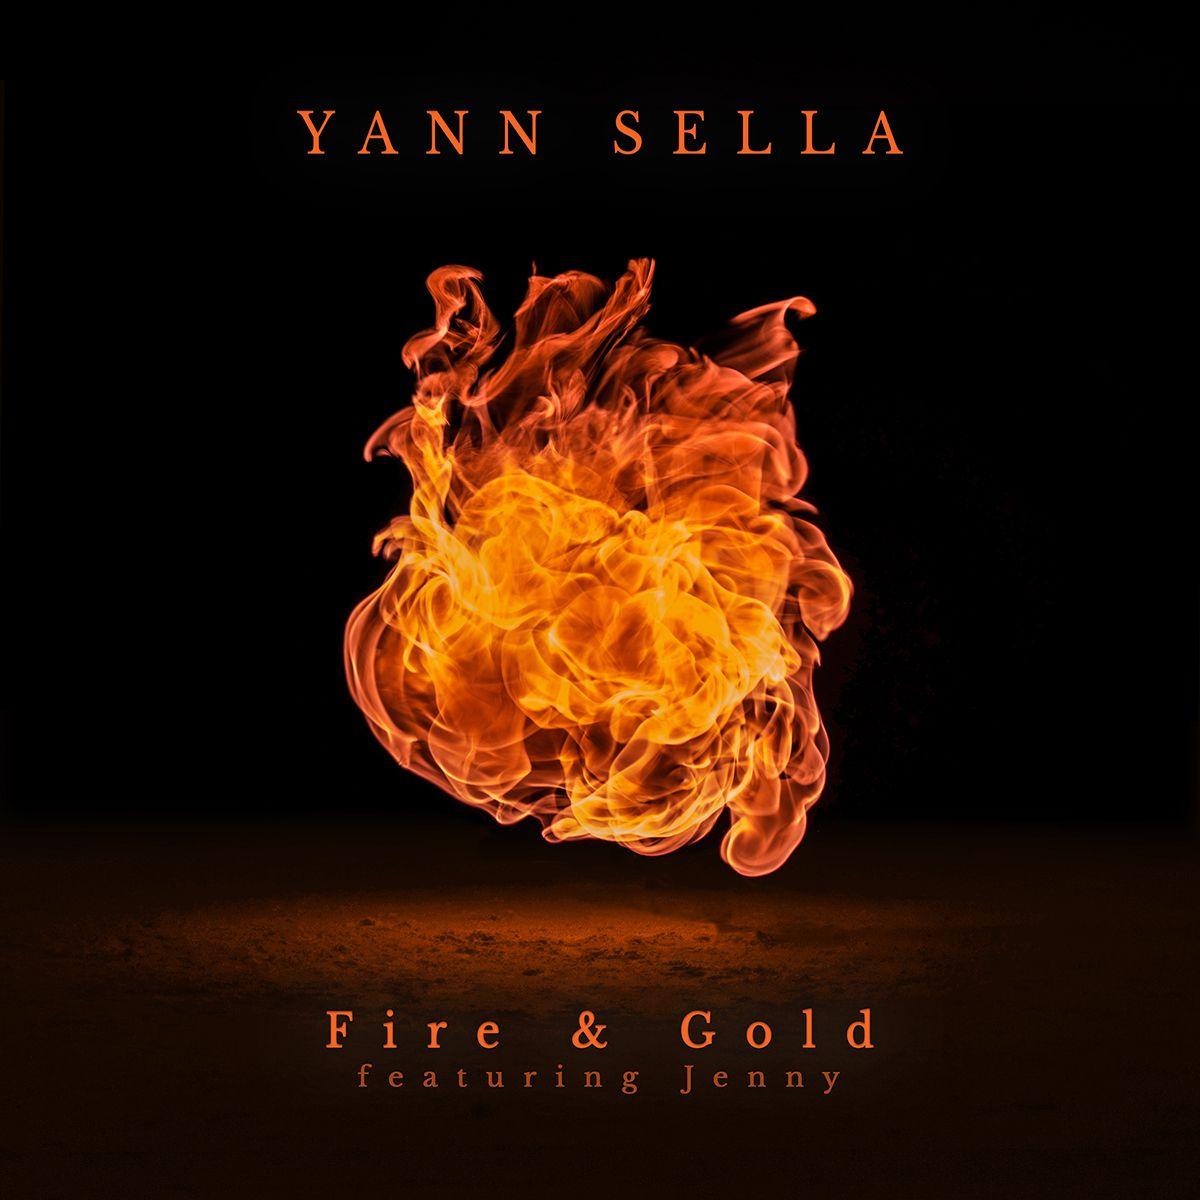 Yann Sella